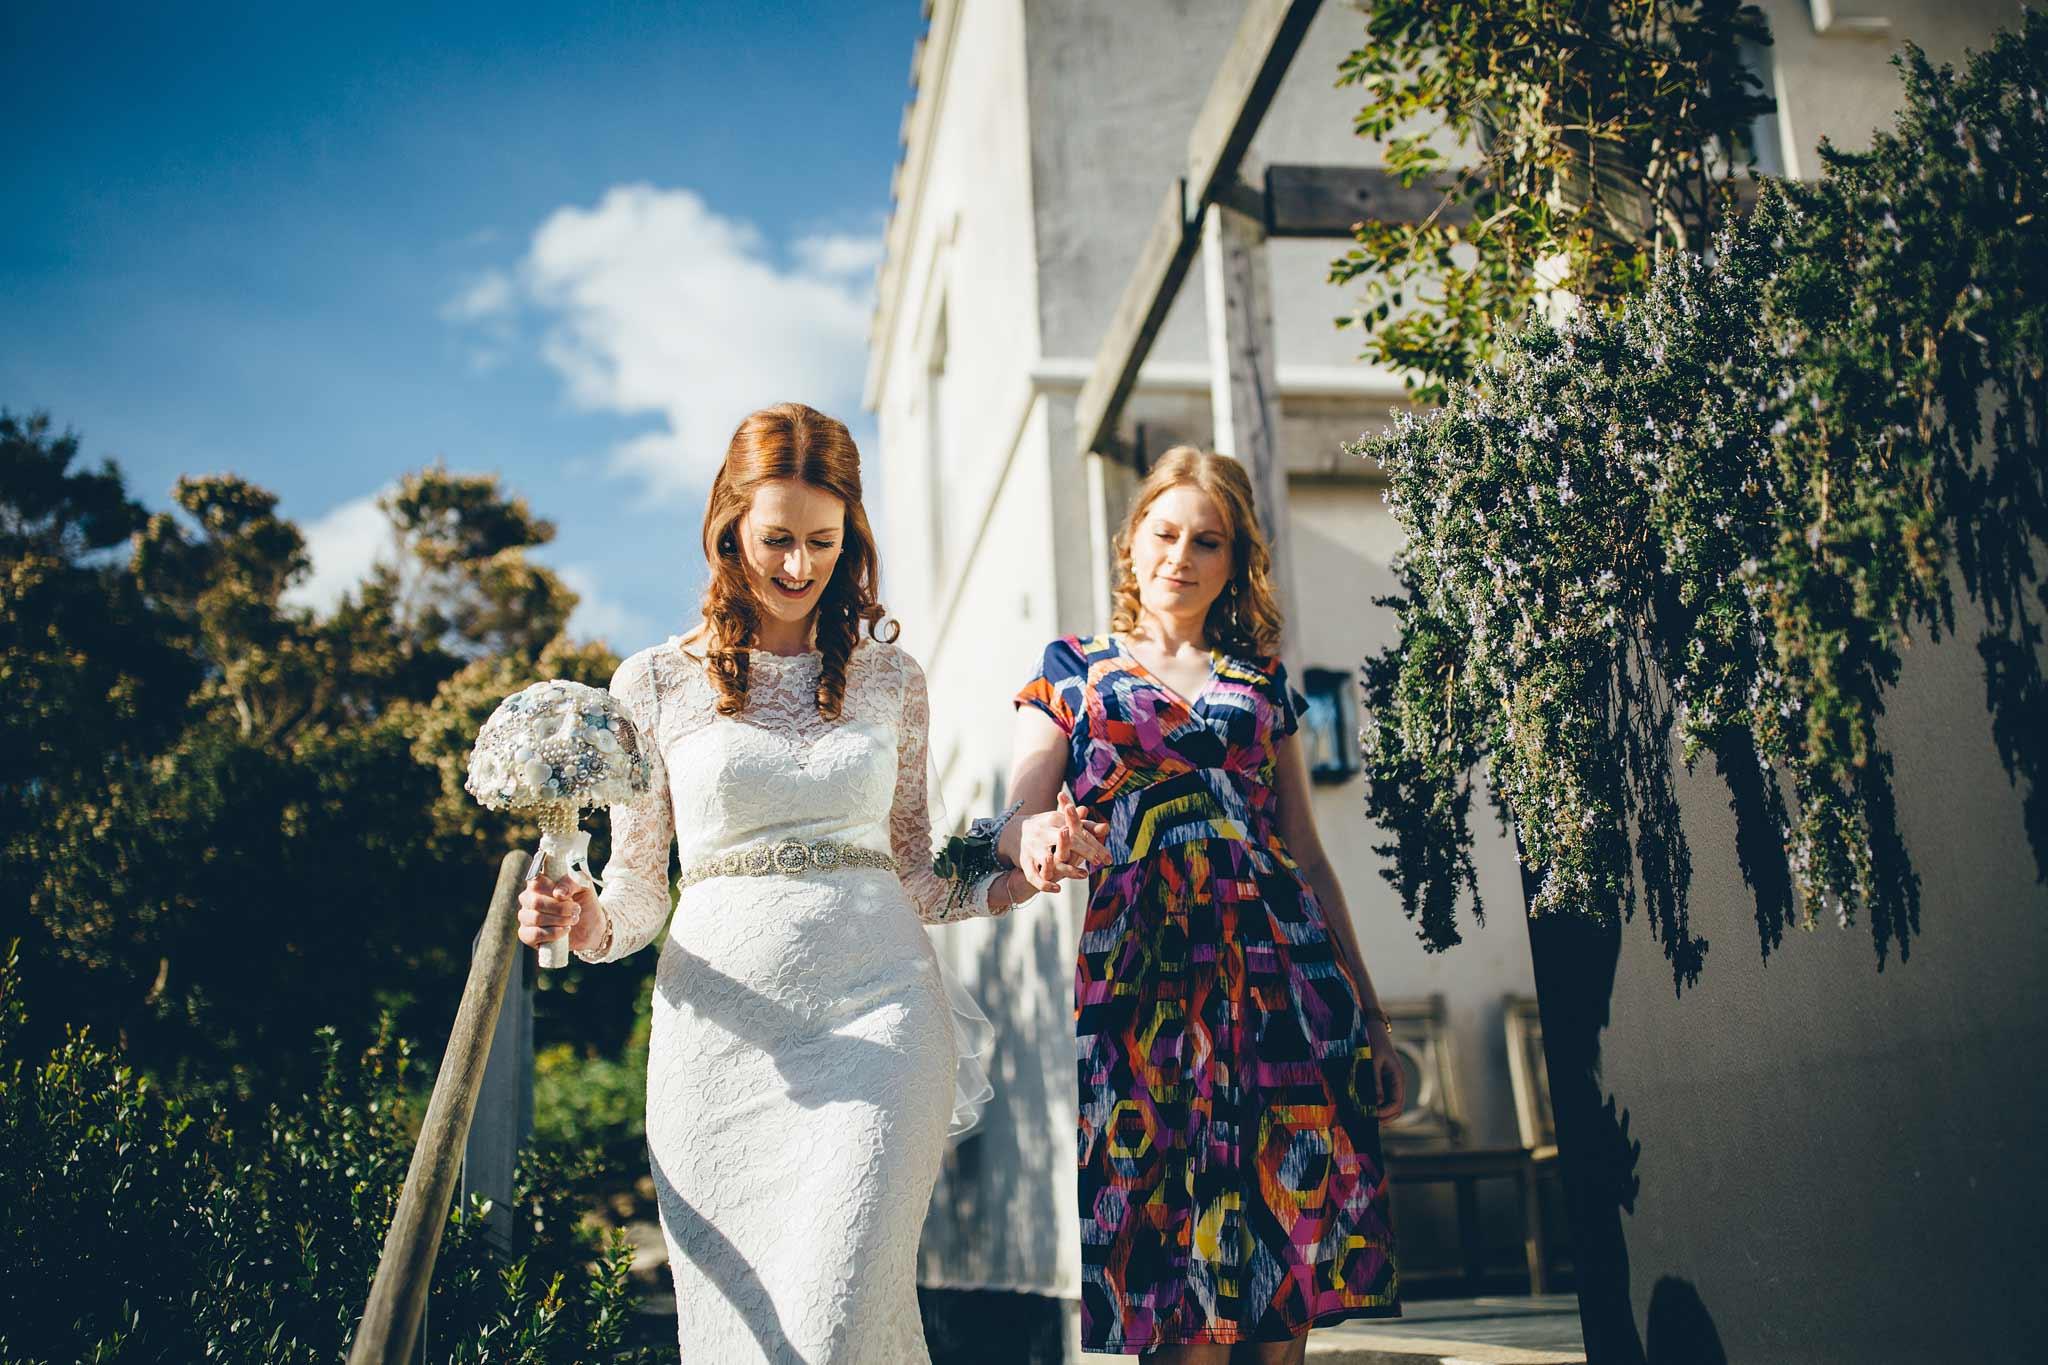 Polpier and Penpol Wedding Photographer 20